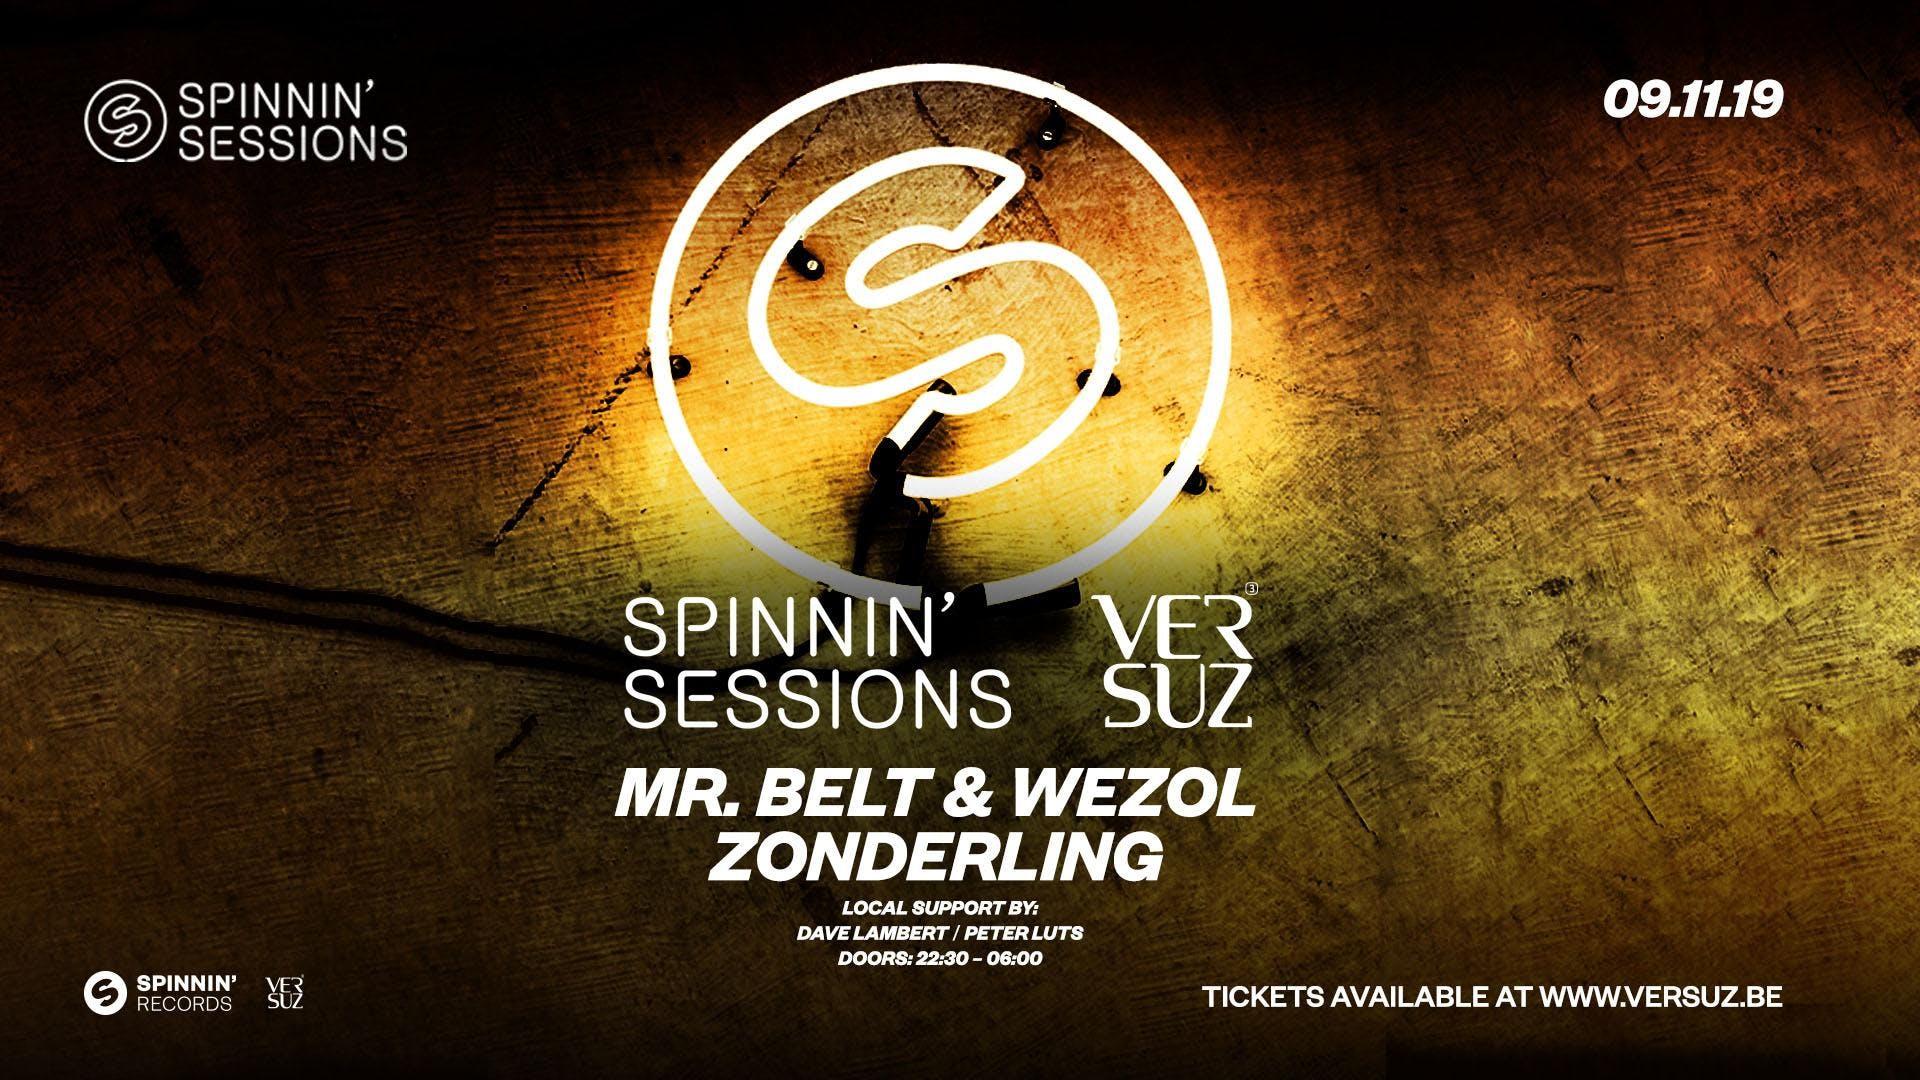 Spinnin' Sessions Versuz w/ Zonderling & Mr. Belt & Wezol